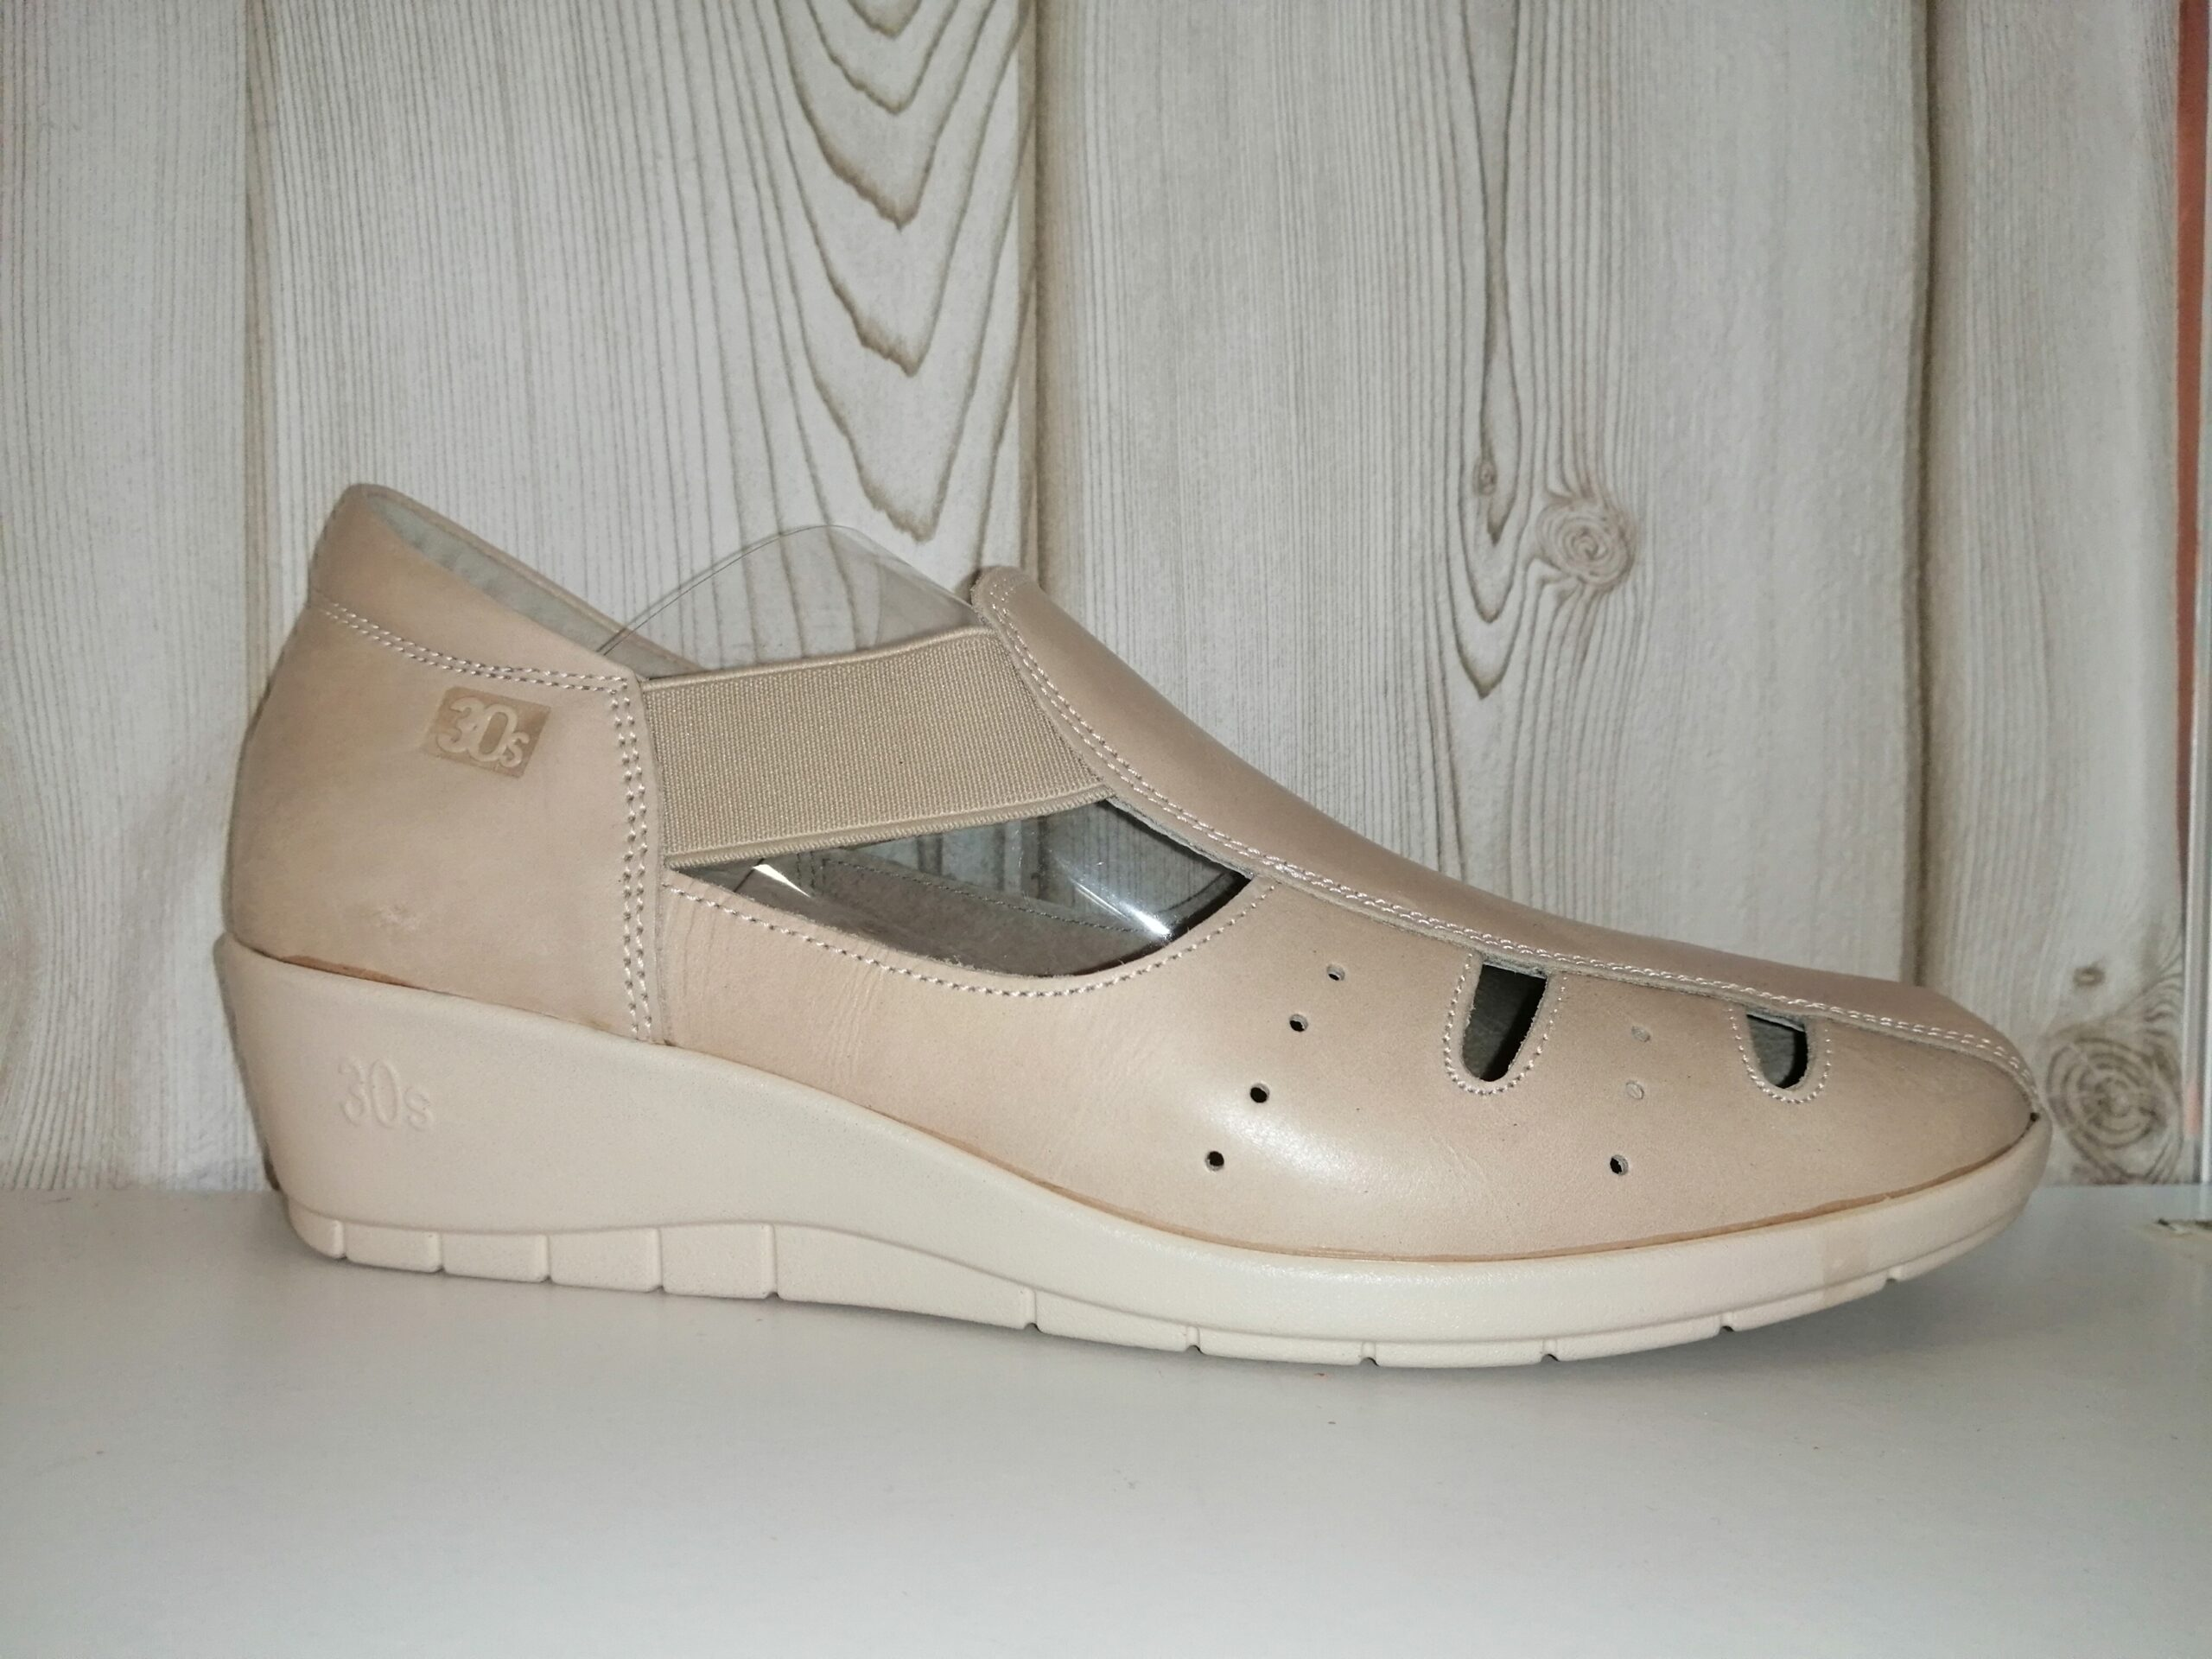 Sandalia beige piel sra especial 3186 30s